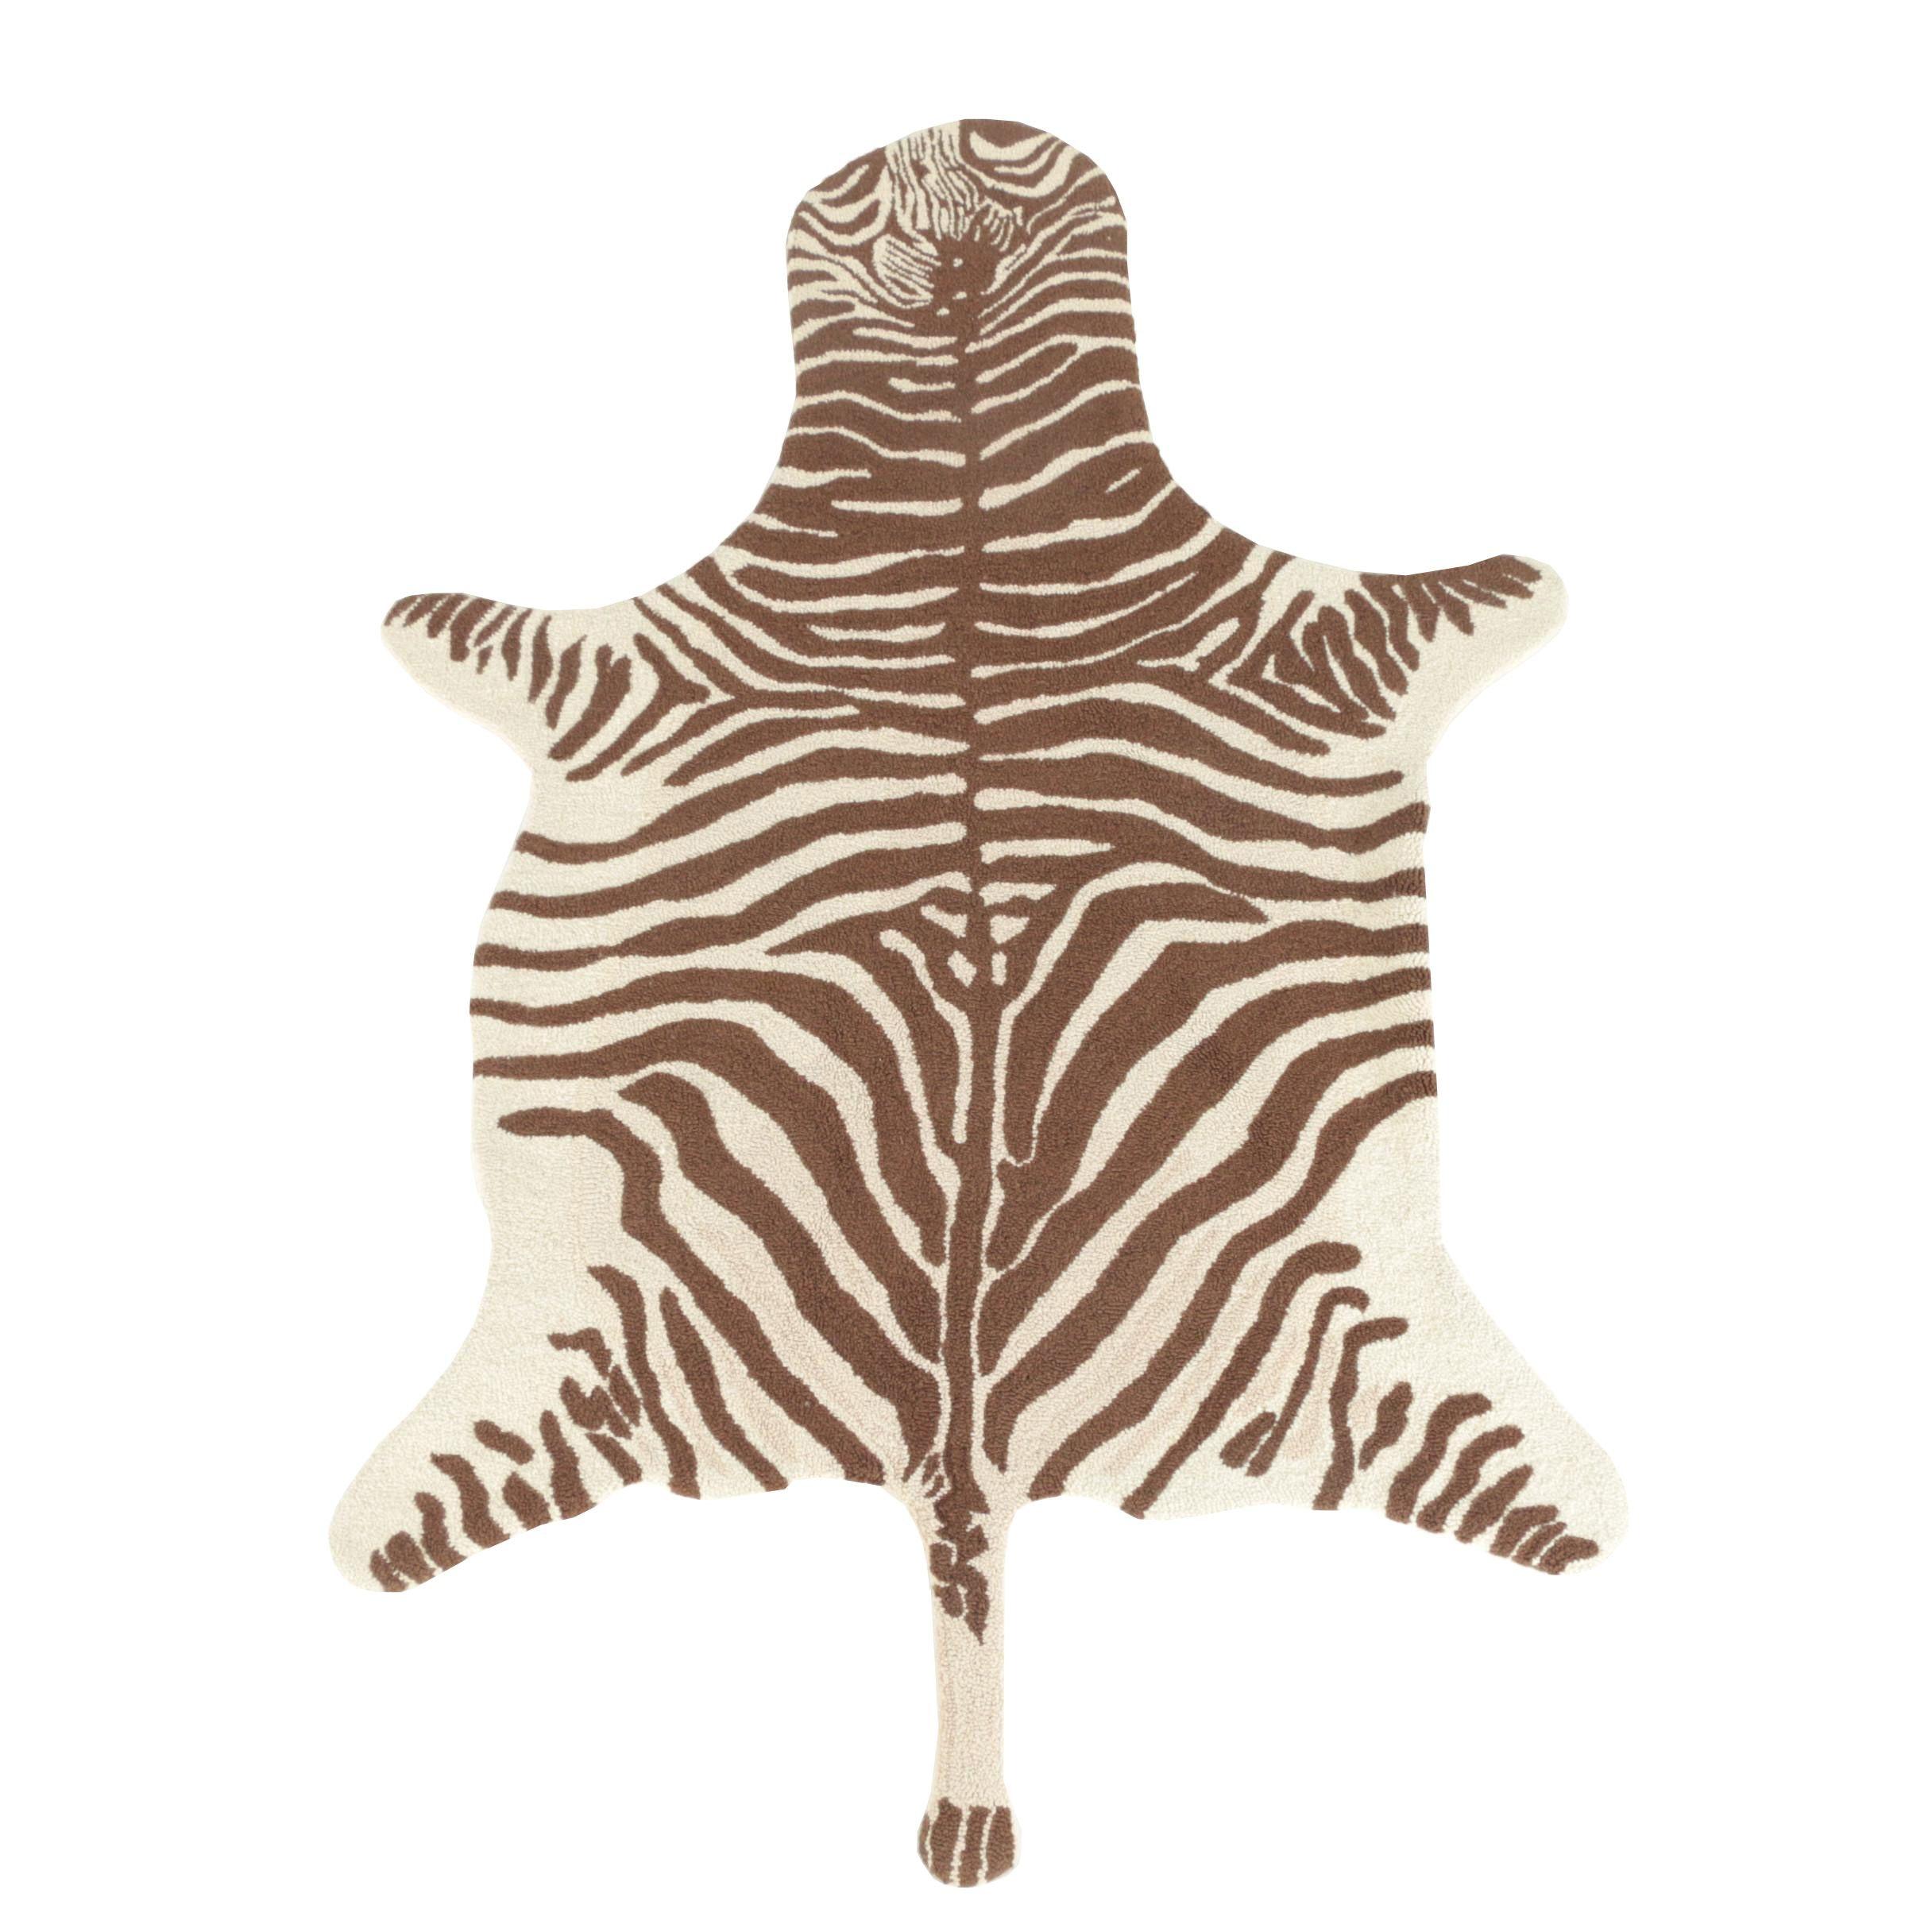 Hand-Hooked McAdoo Zebra Pattern Wool Area Rug